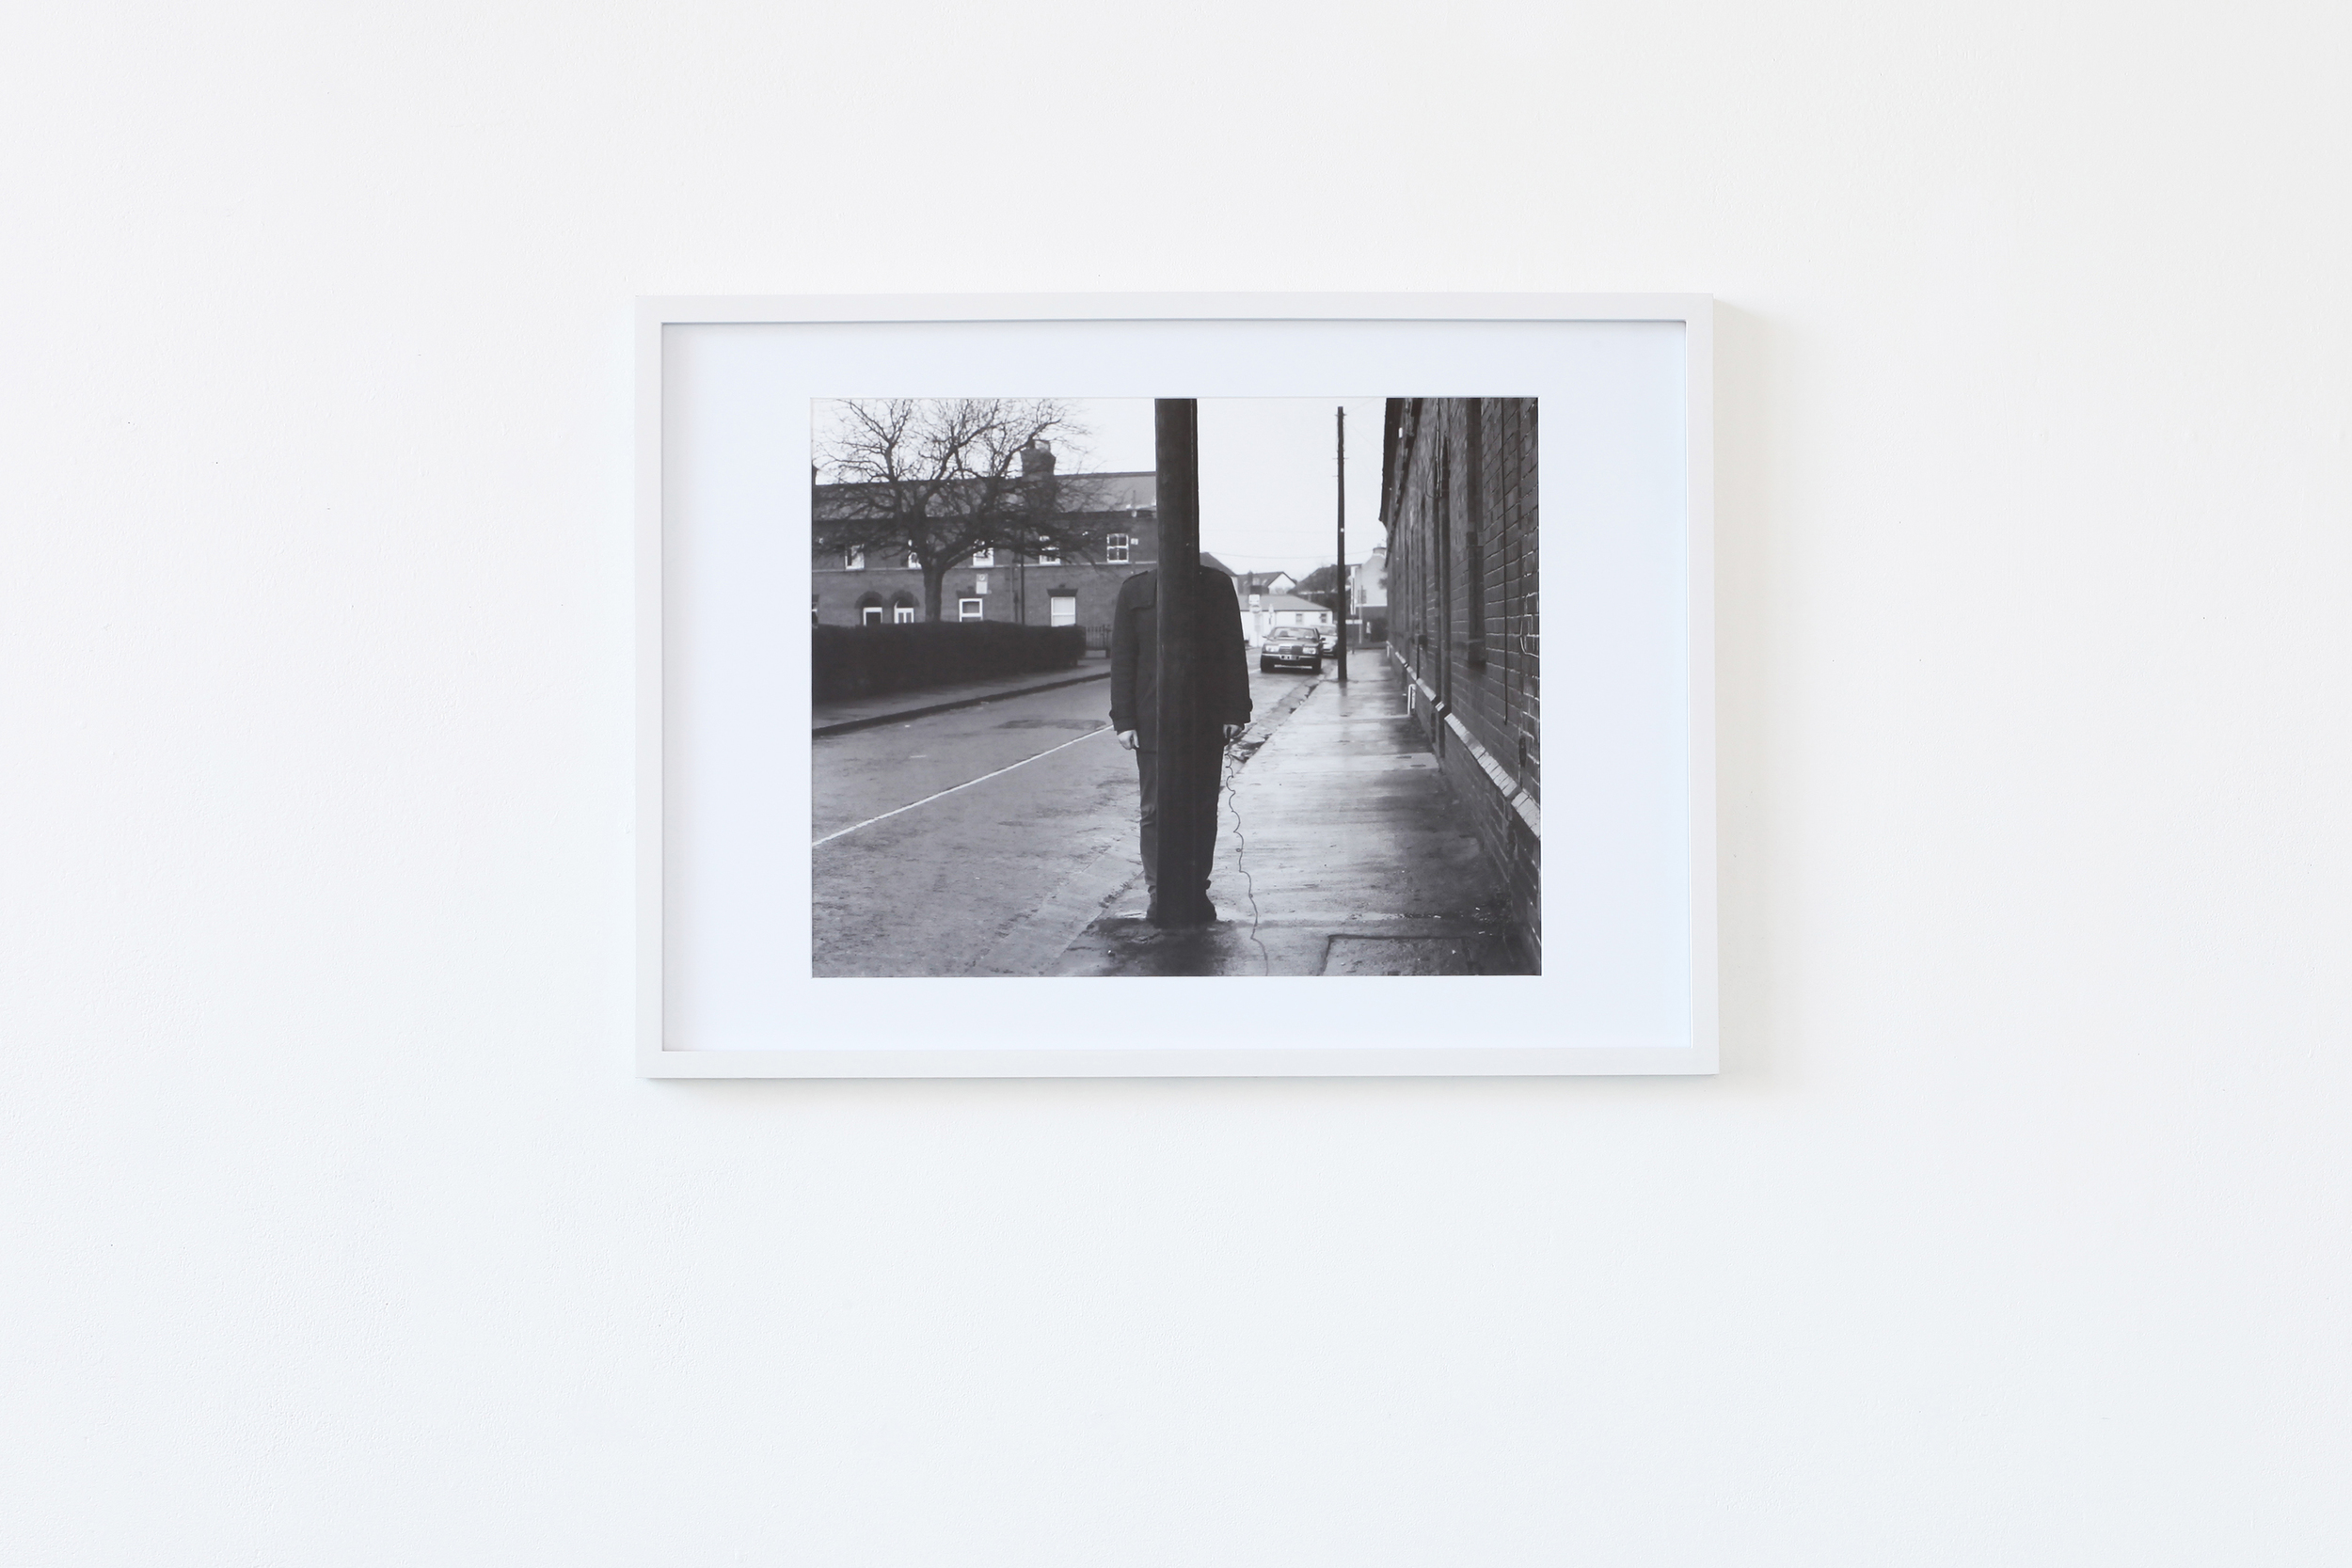 Untitled #7, 1 Archival pigment print in white frame,2014 @Andrei Venghiac